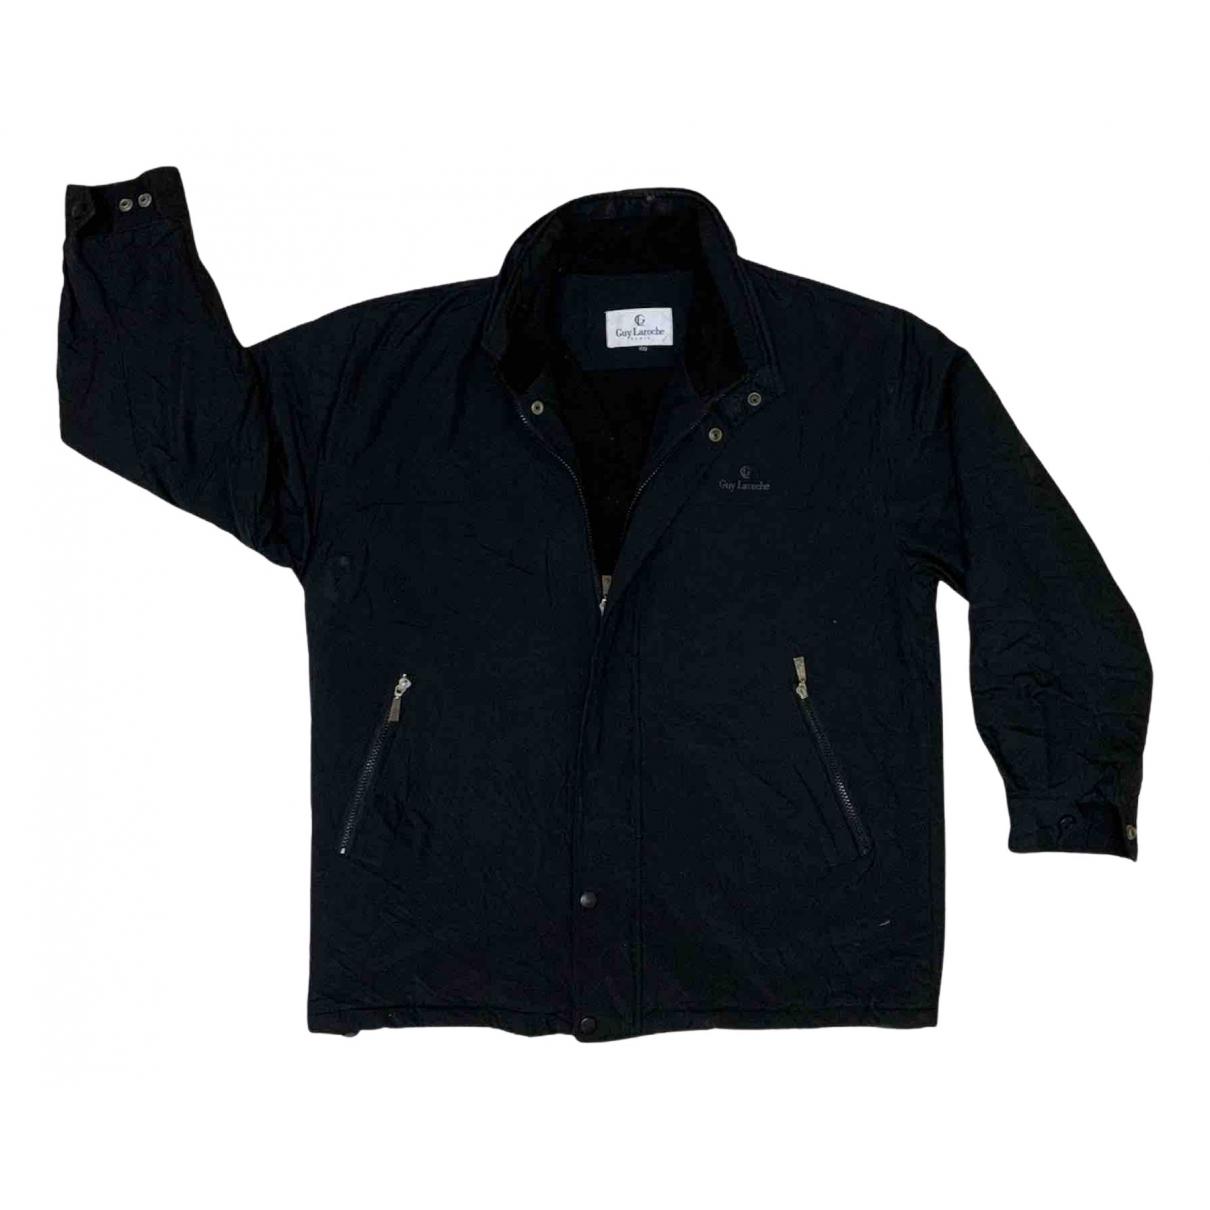 Guy Laroche N Black Cotton jacket  for Men L International